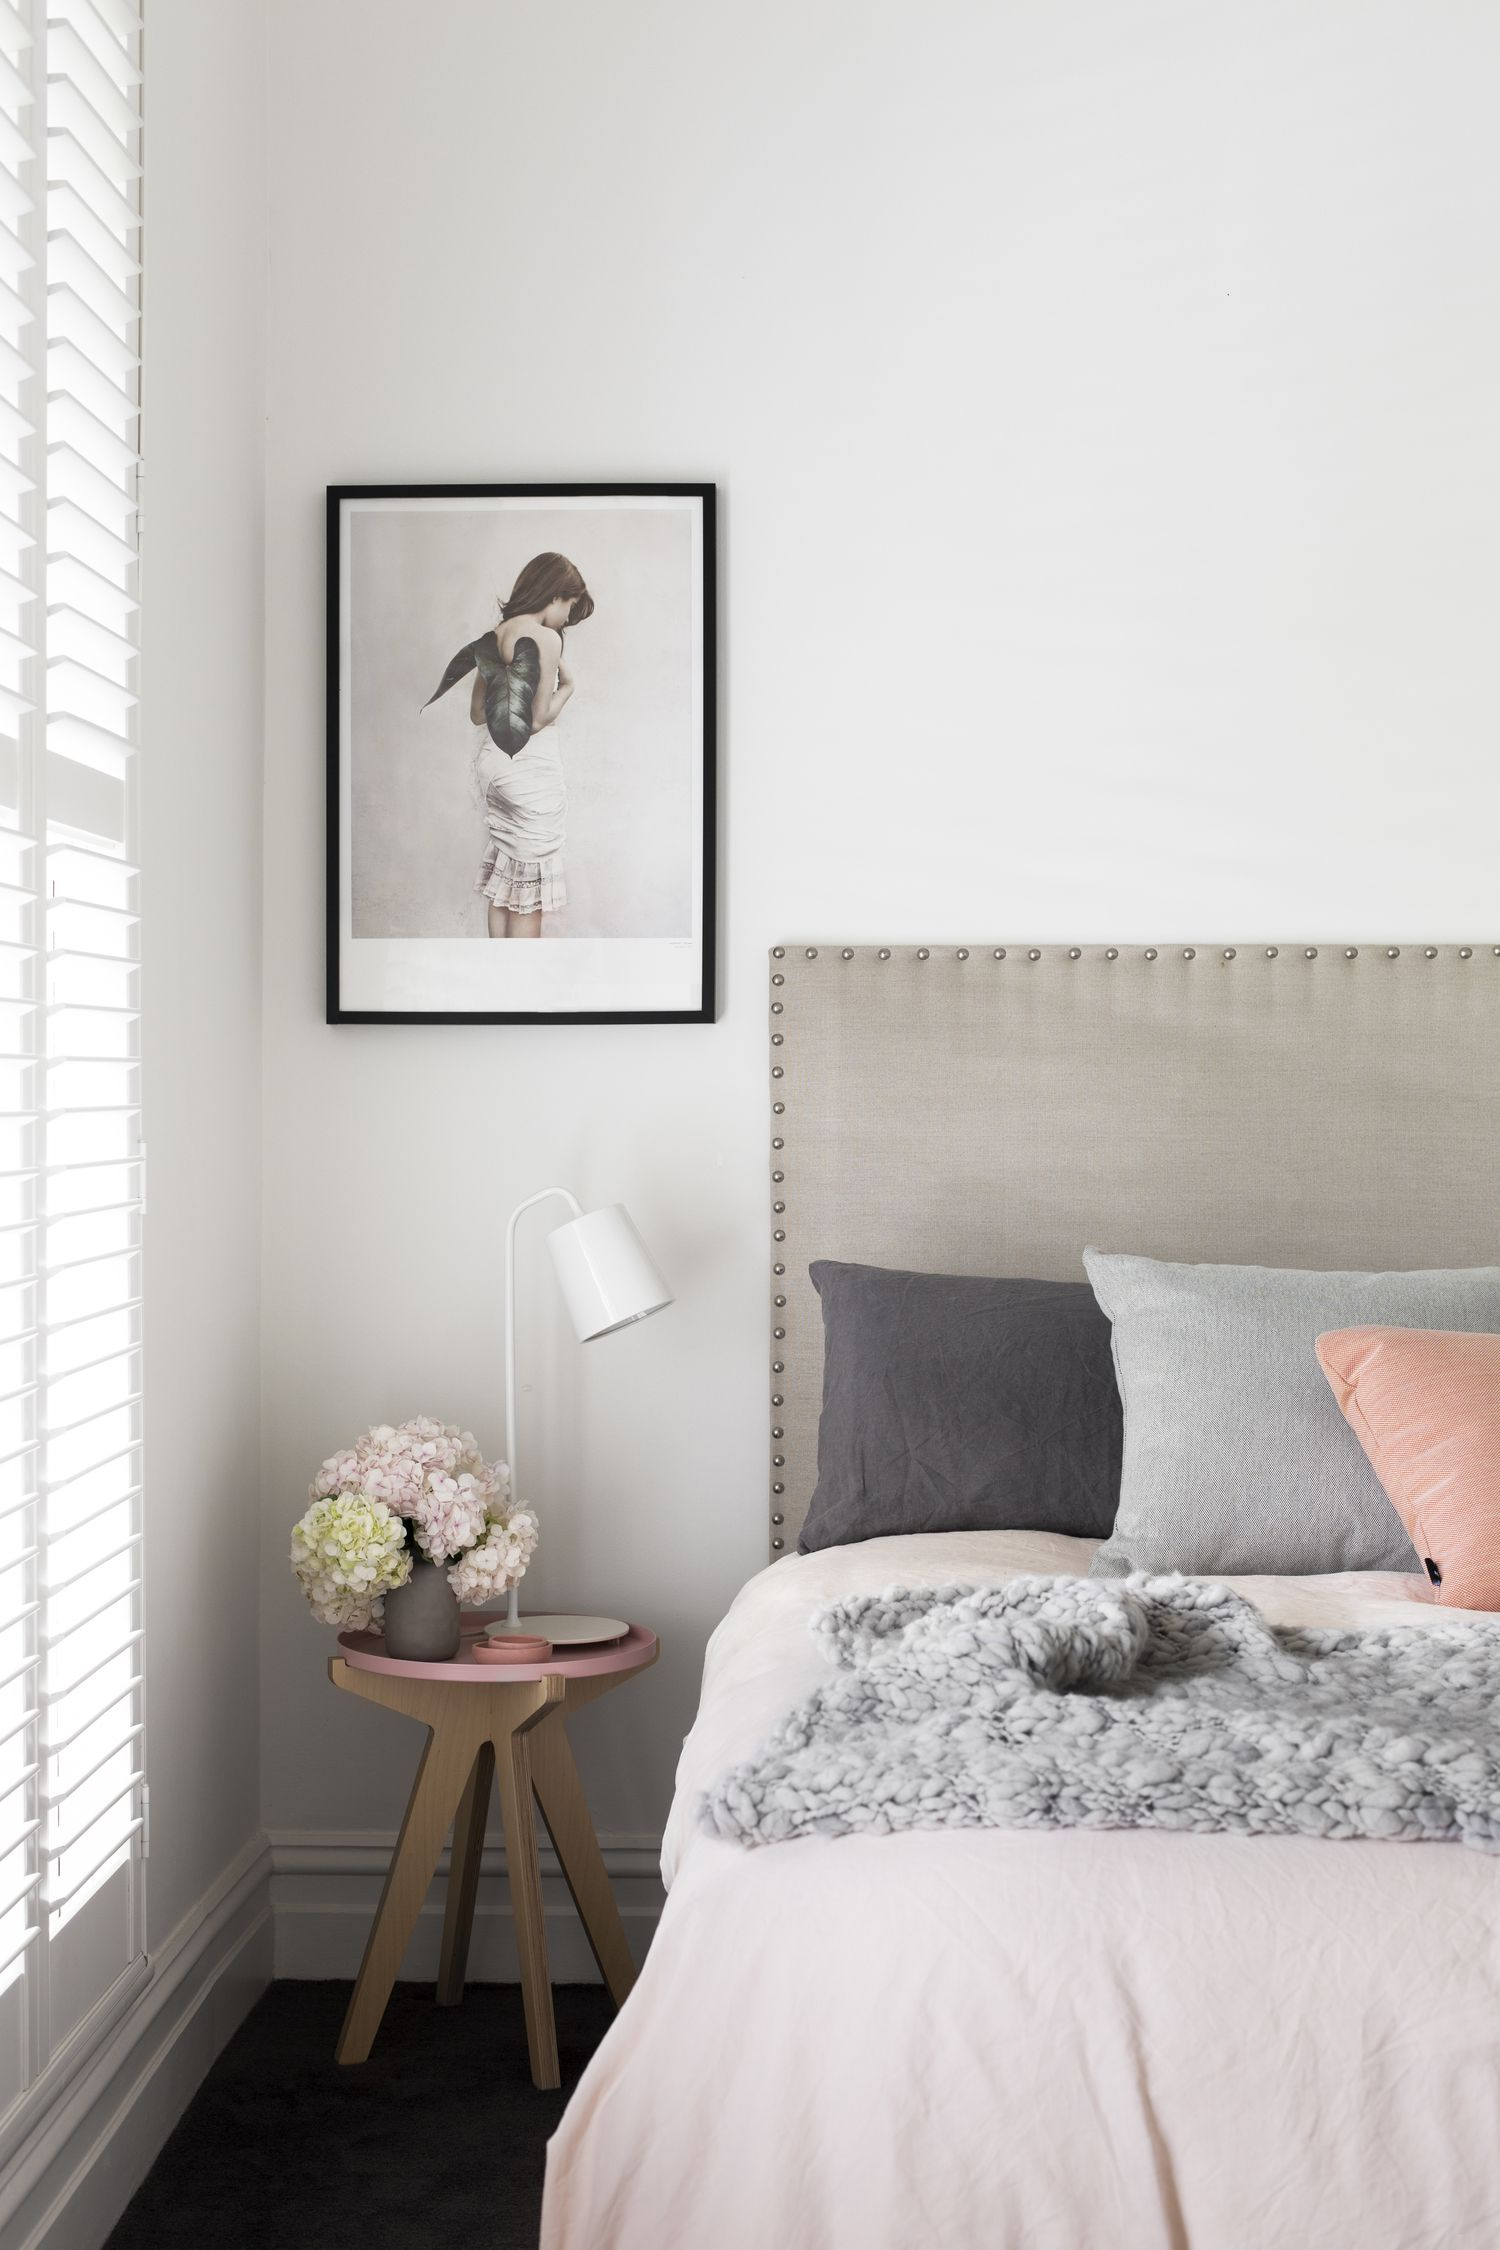 Stylist julia treuel of show pony interiors has applied cool tones